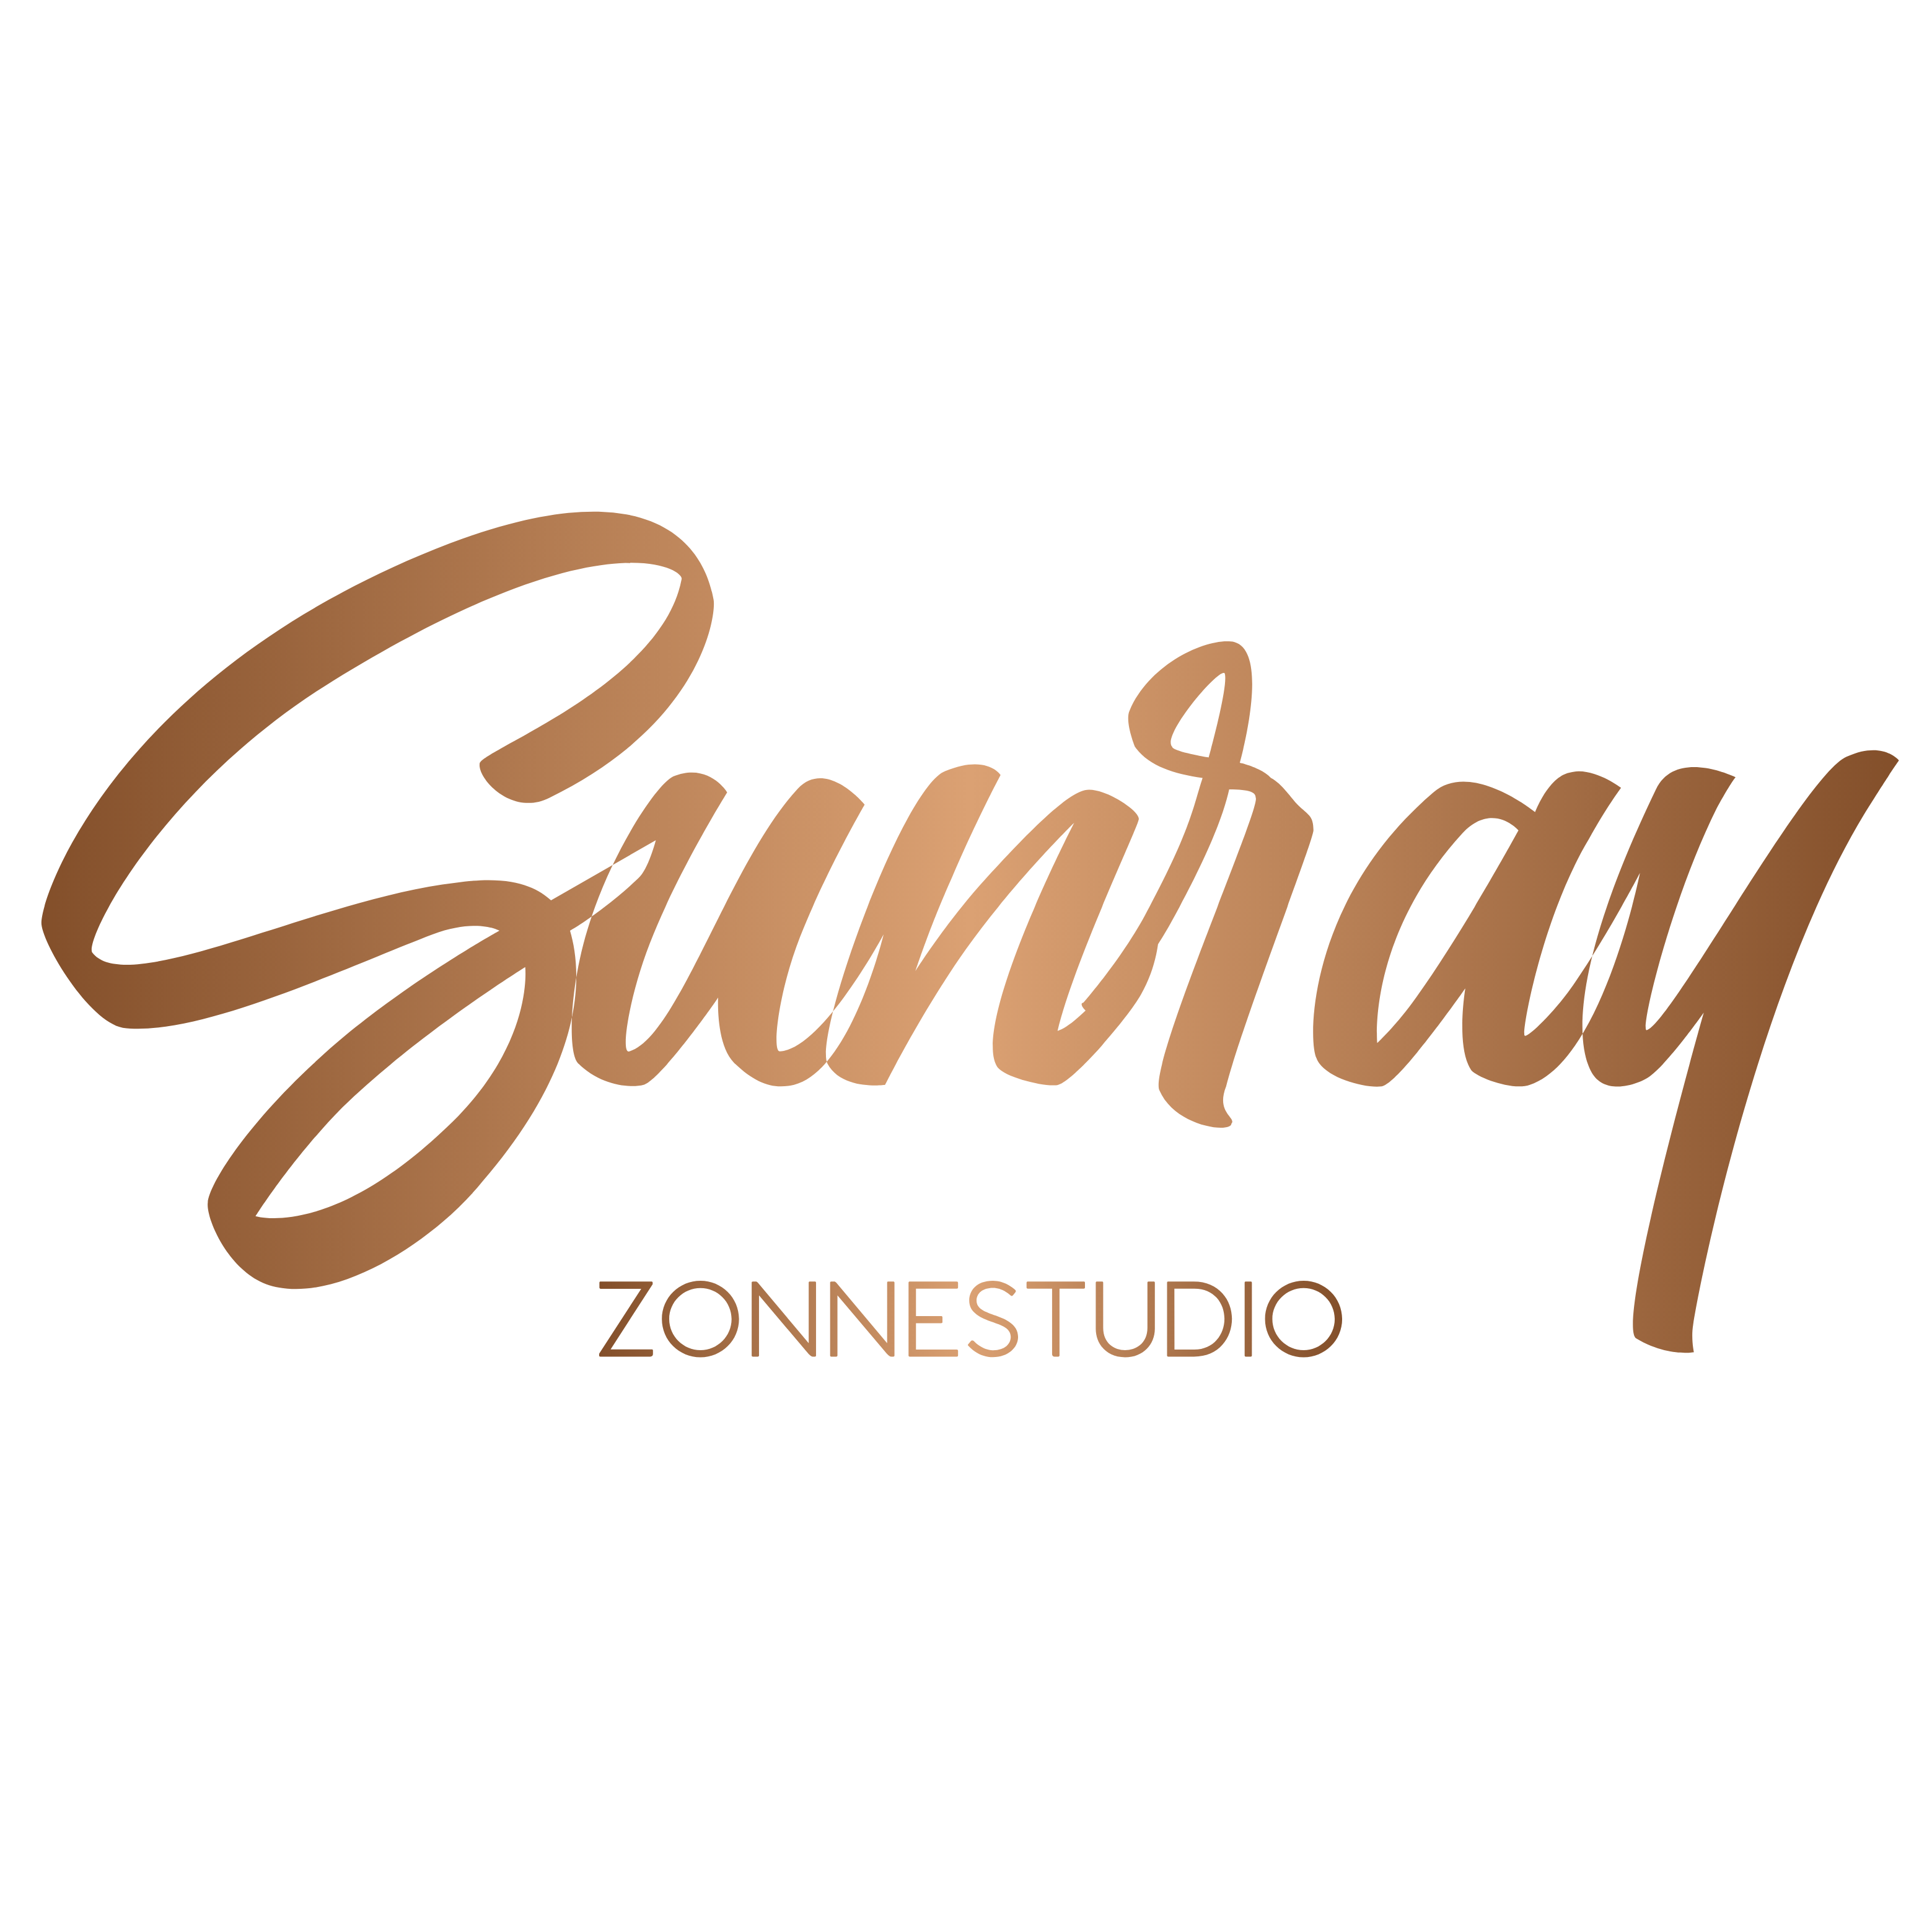 Sunray Zonnestudio